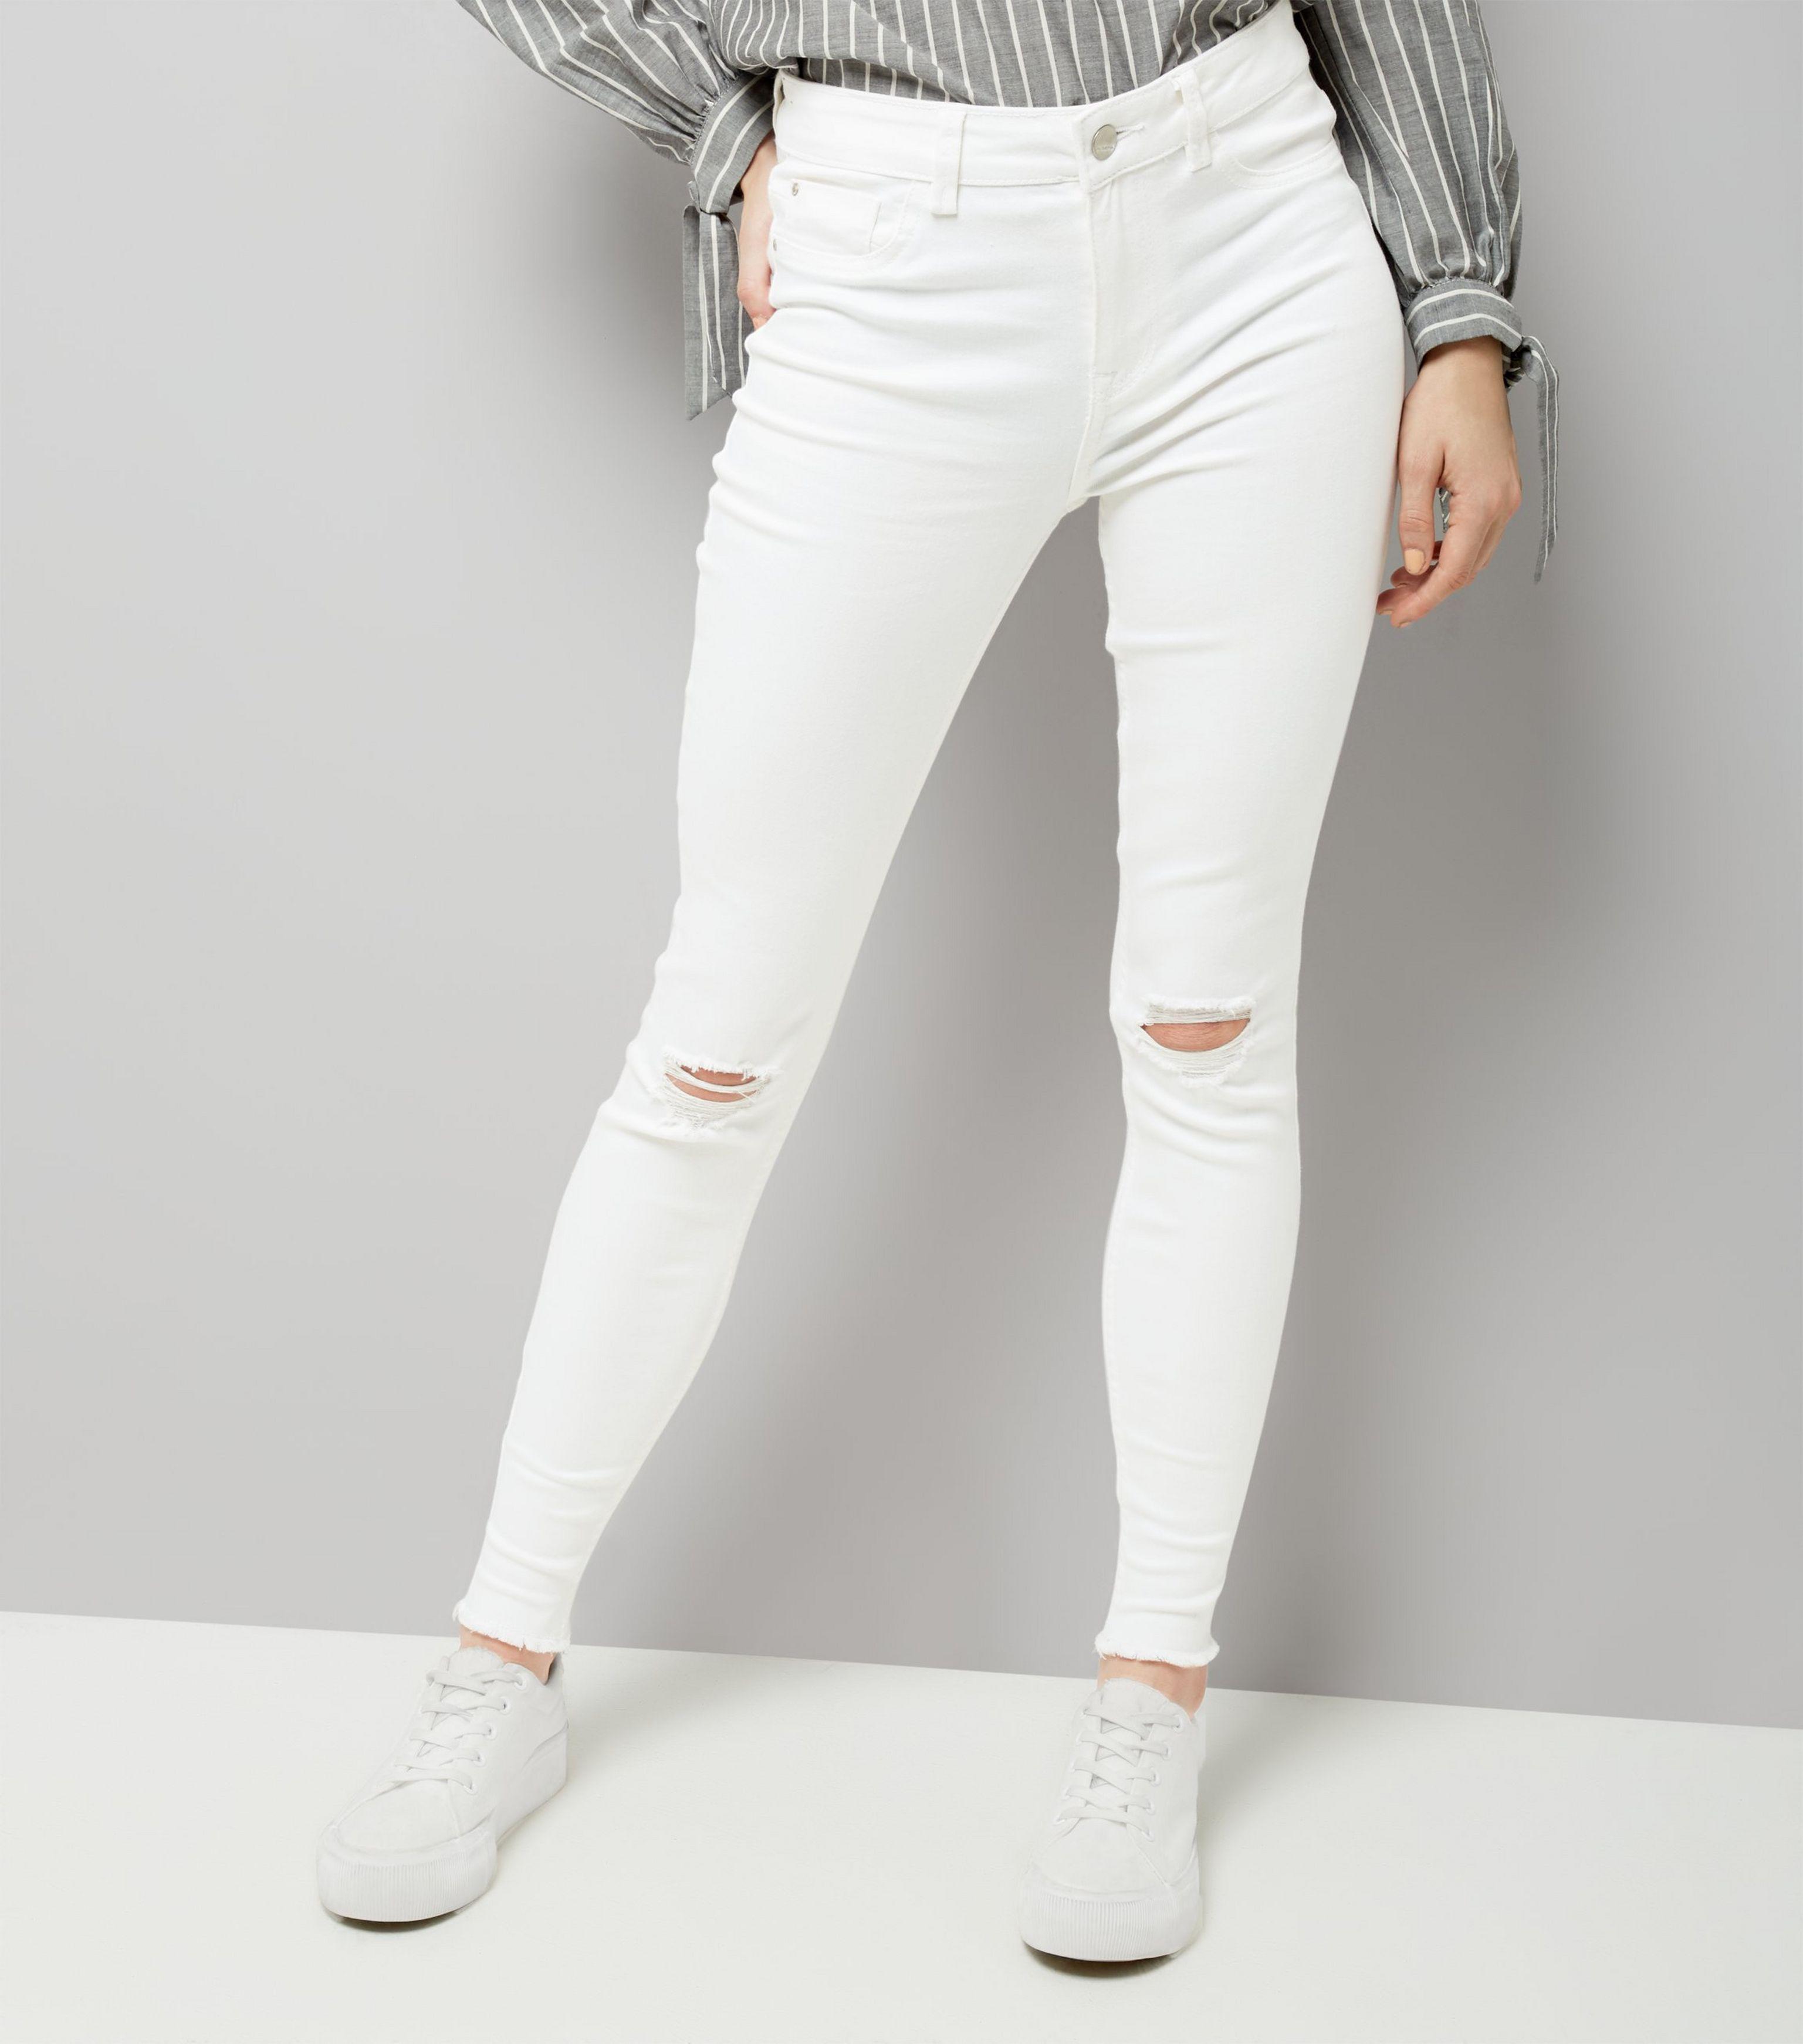 51484823452 New Look White Ripped Knee Fray Hem Skinny Jenna Jeans in White - Lyst